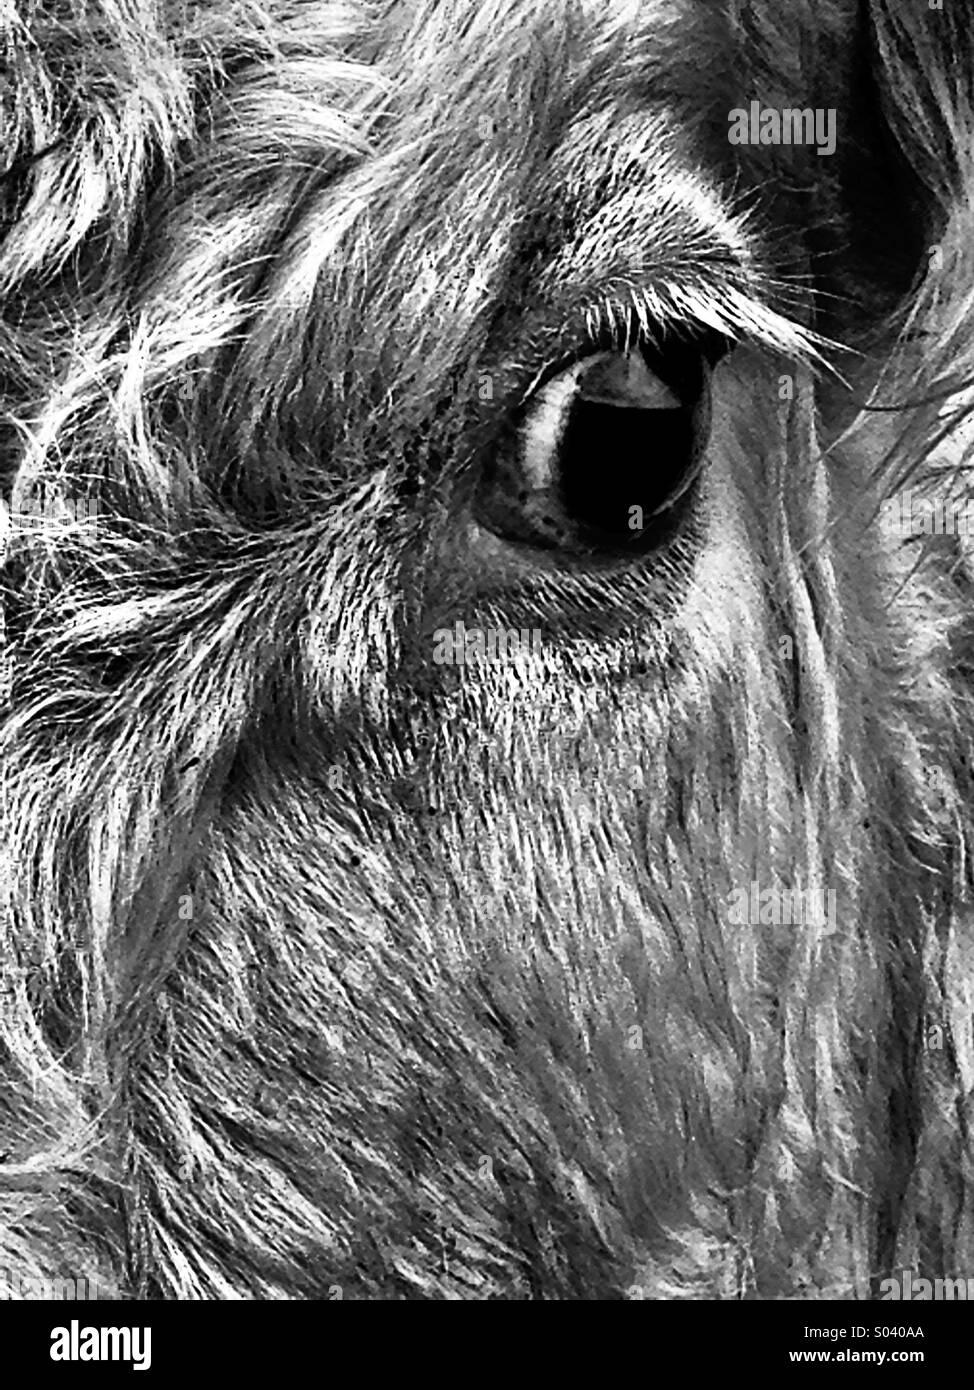 Animal texture - Stock Image